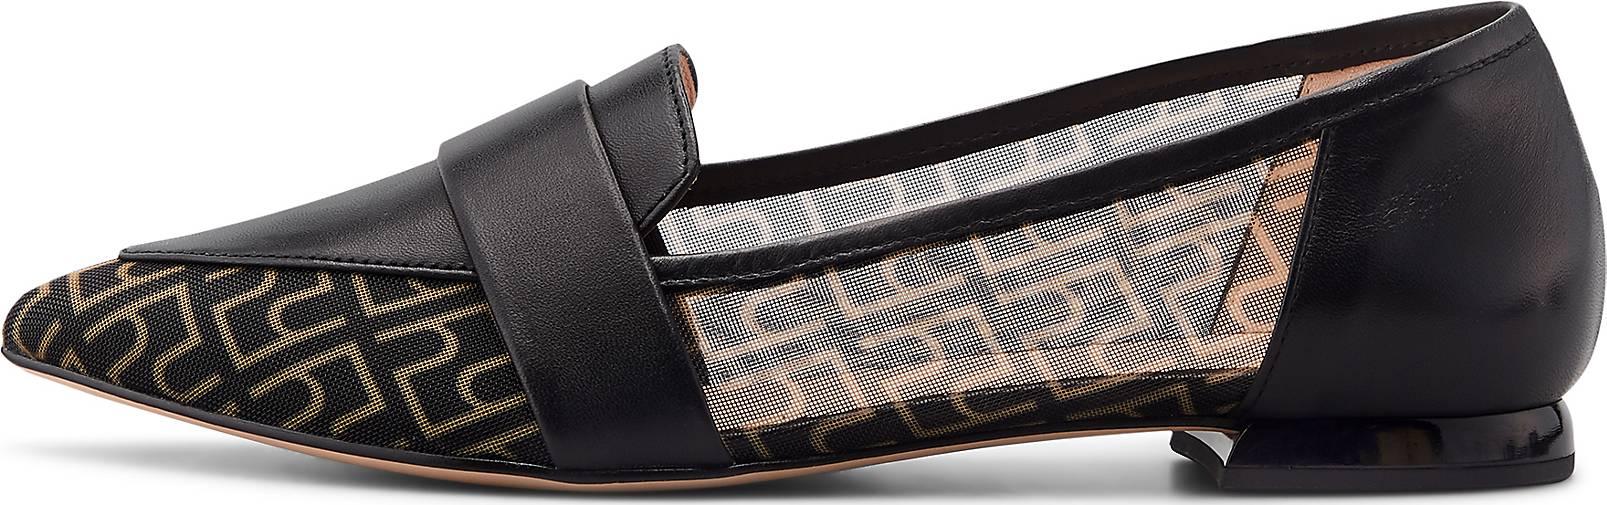 Högl Fashion-Loafer